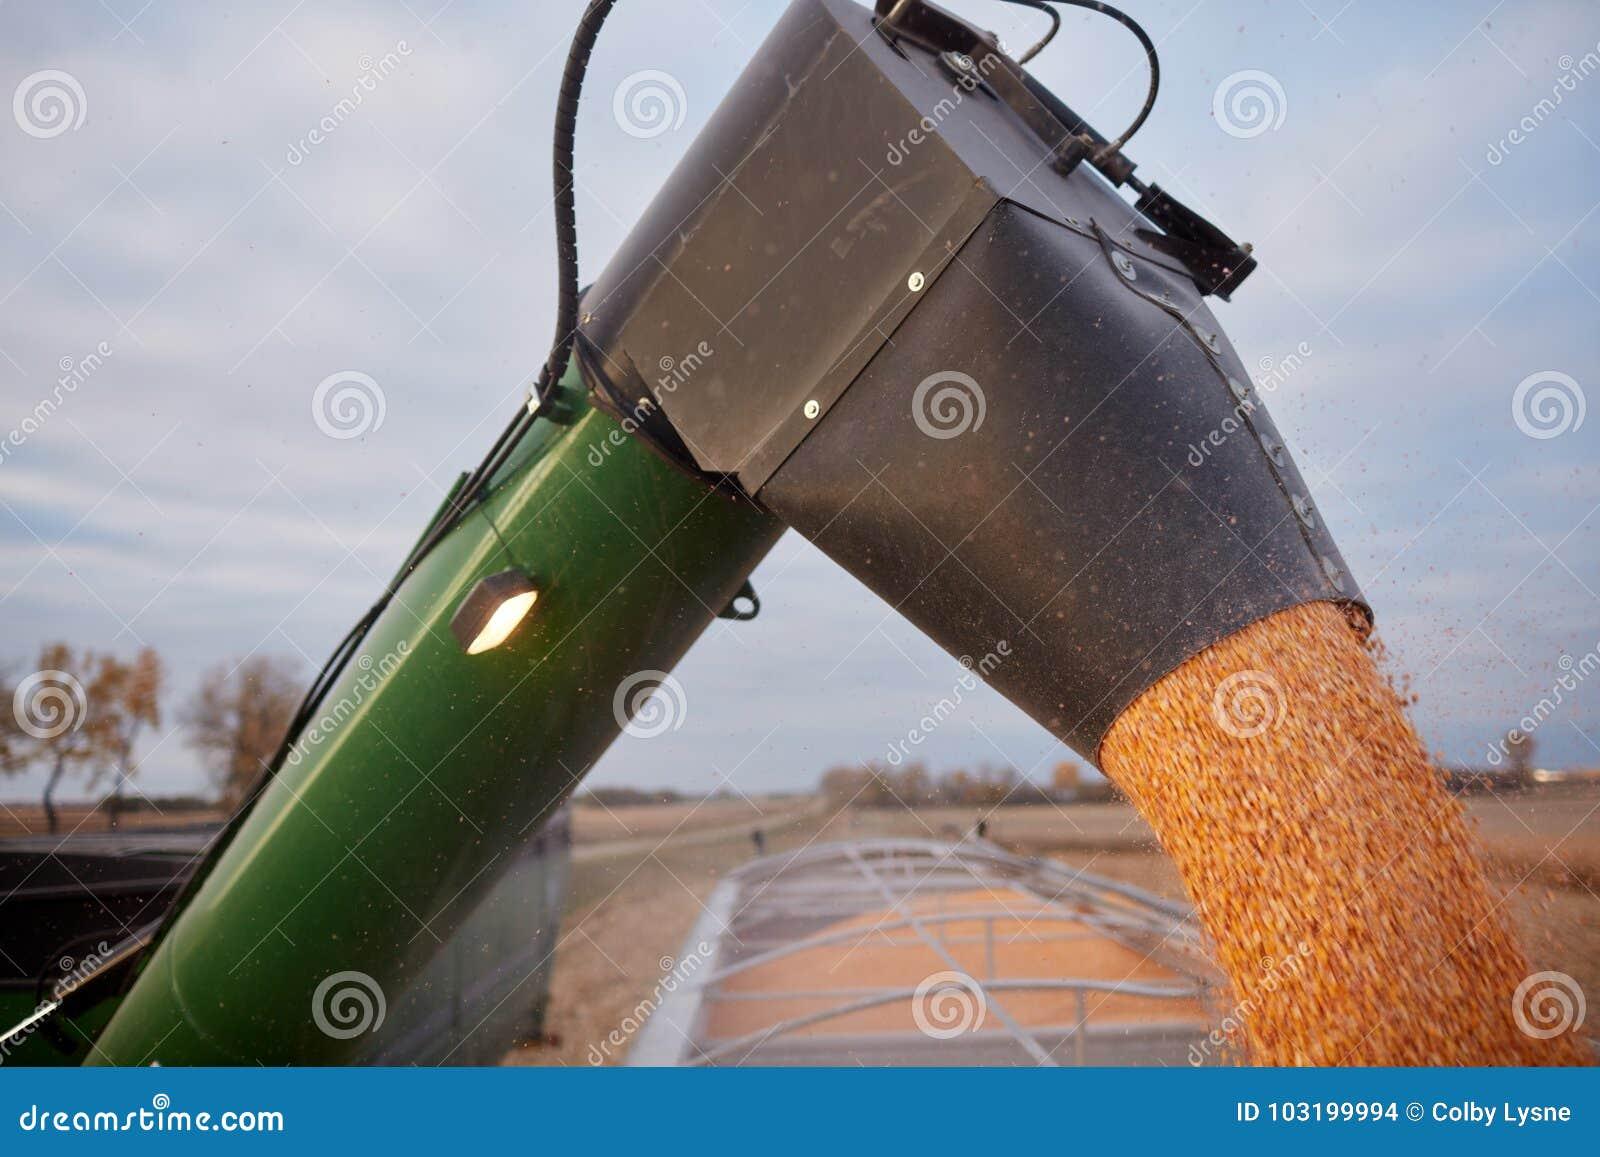 Maaidorser vullend een landbouwbedrijfvrachtwagen